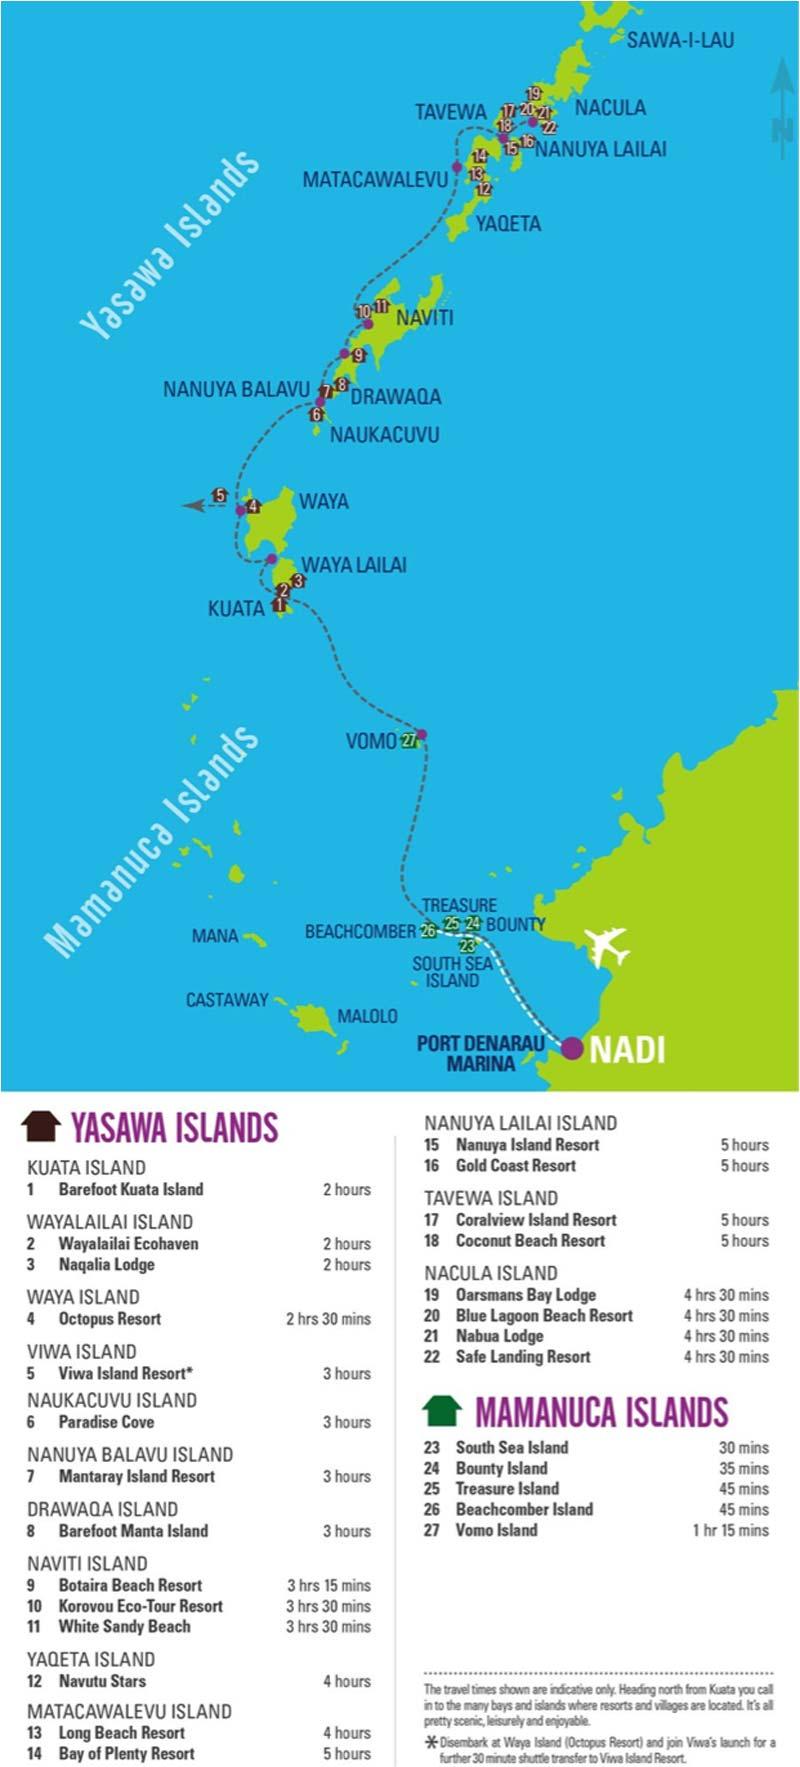 Mapa y transporte en las islas Fiji